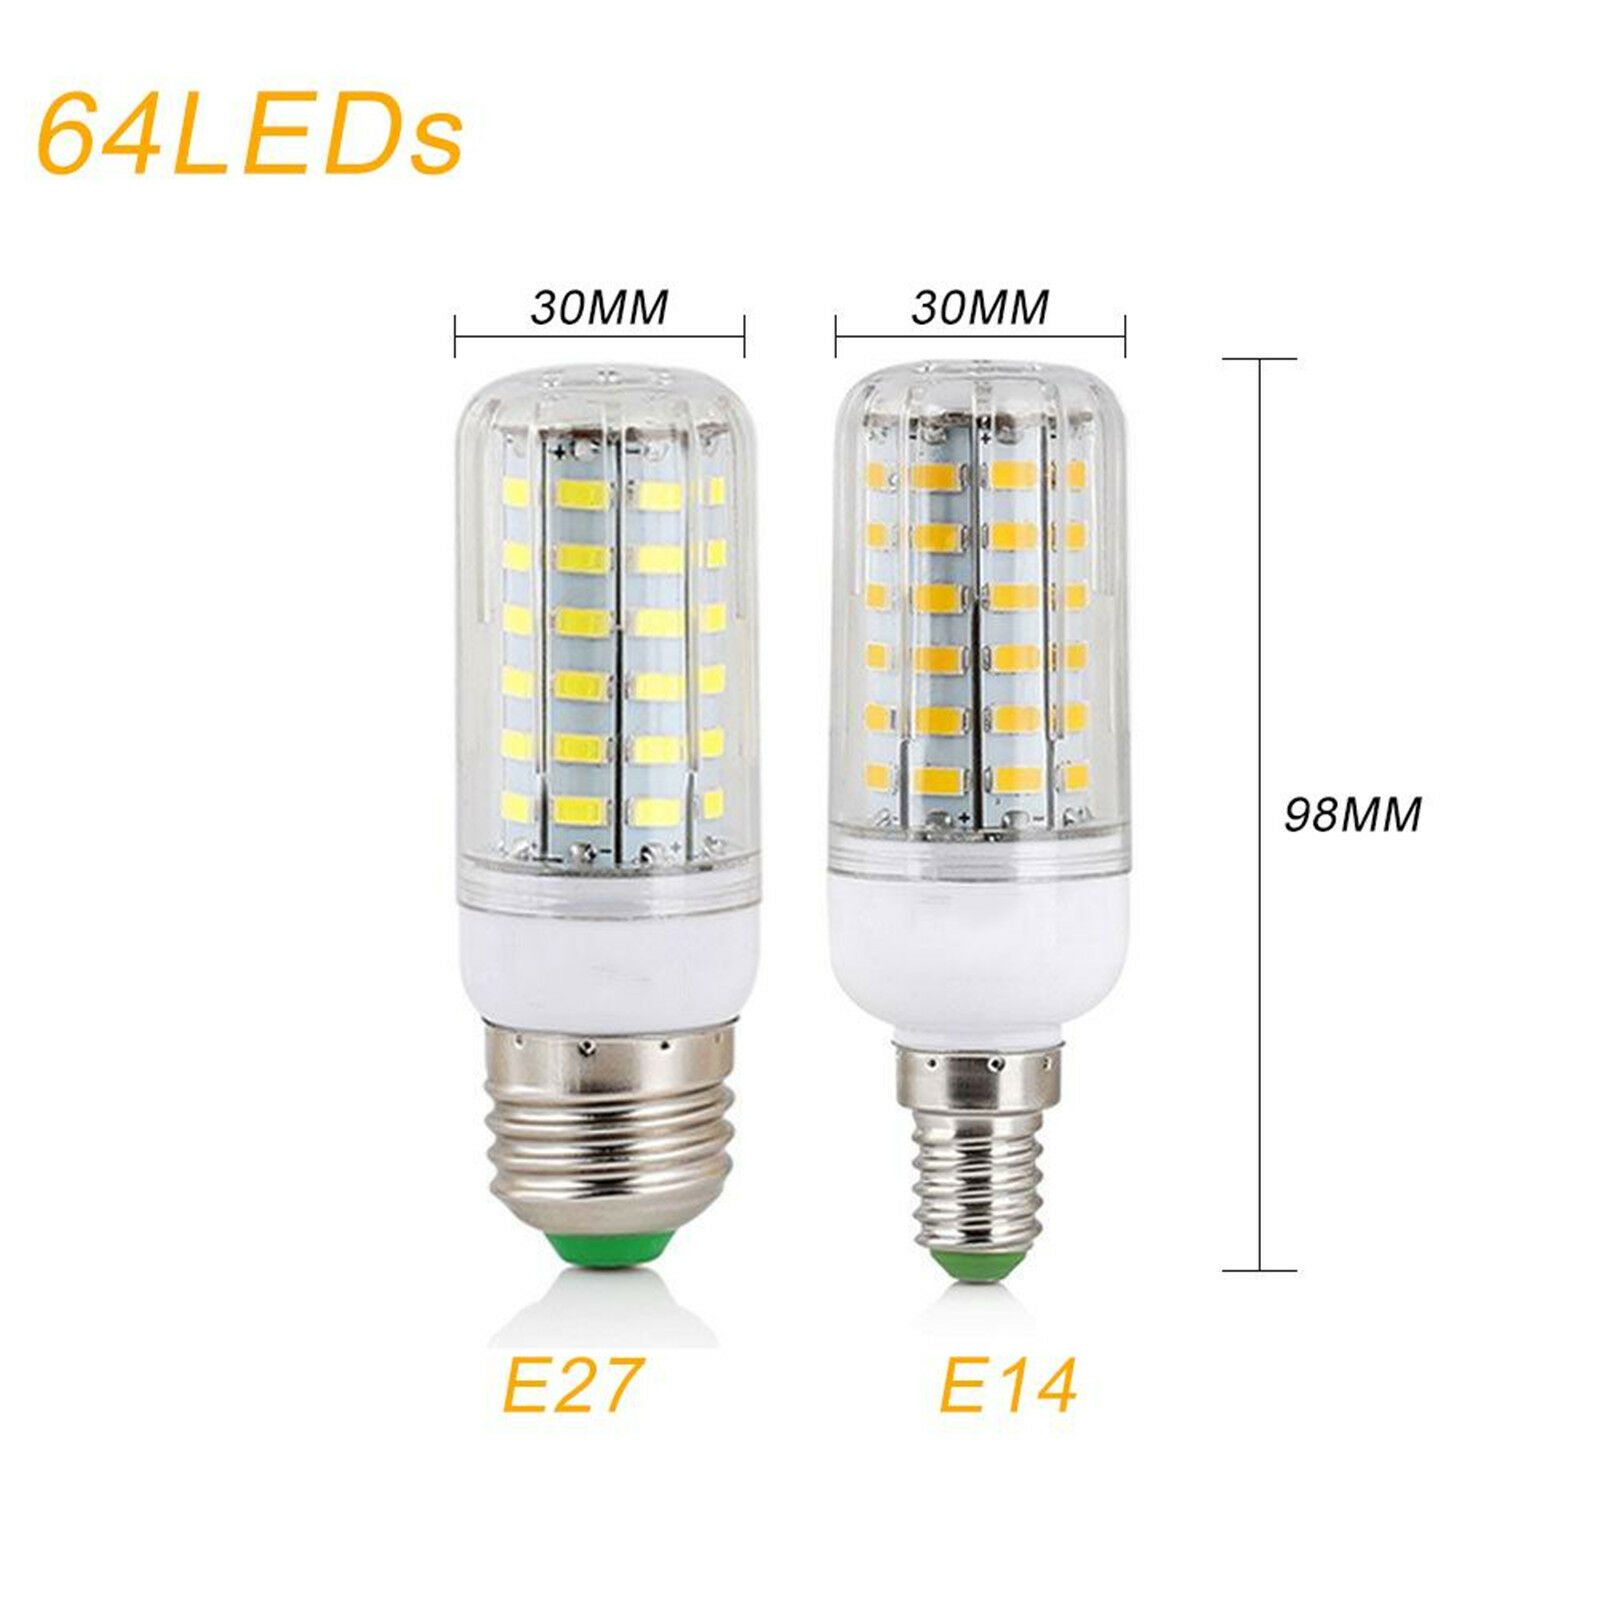 E27 E14 7W 9W 12W 15W 20W 25W 5730 SMD LED Corn Bulb Lamp Light Bright 110/220V 10